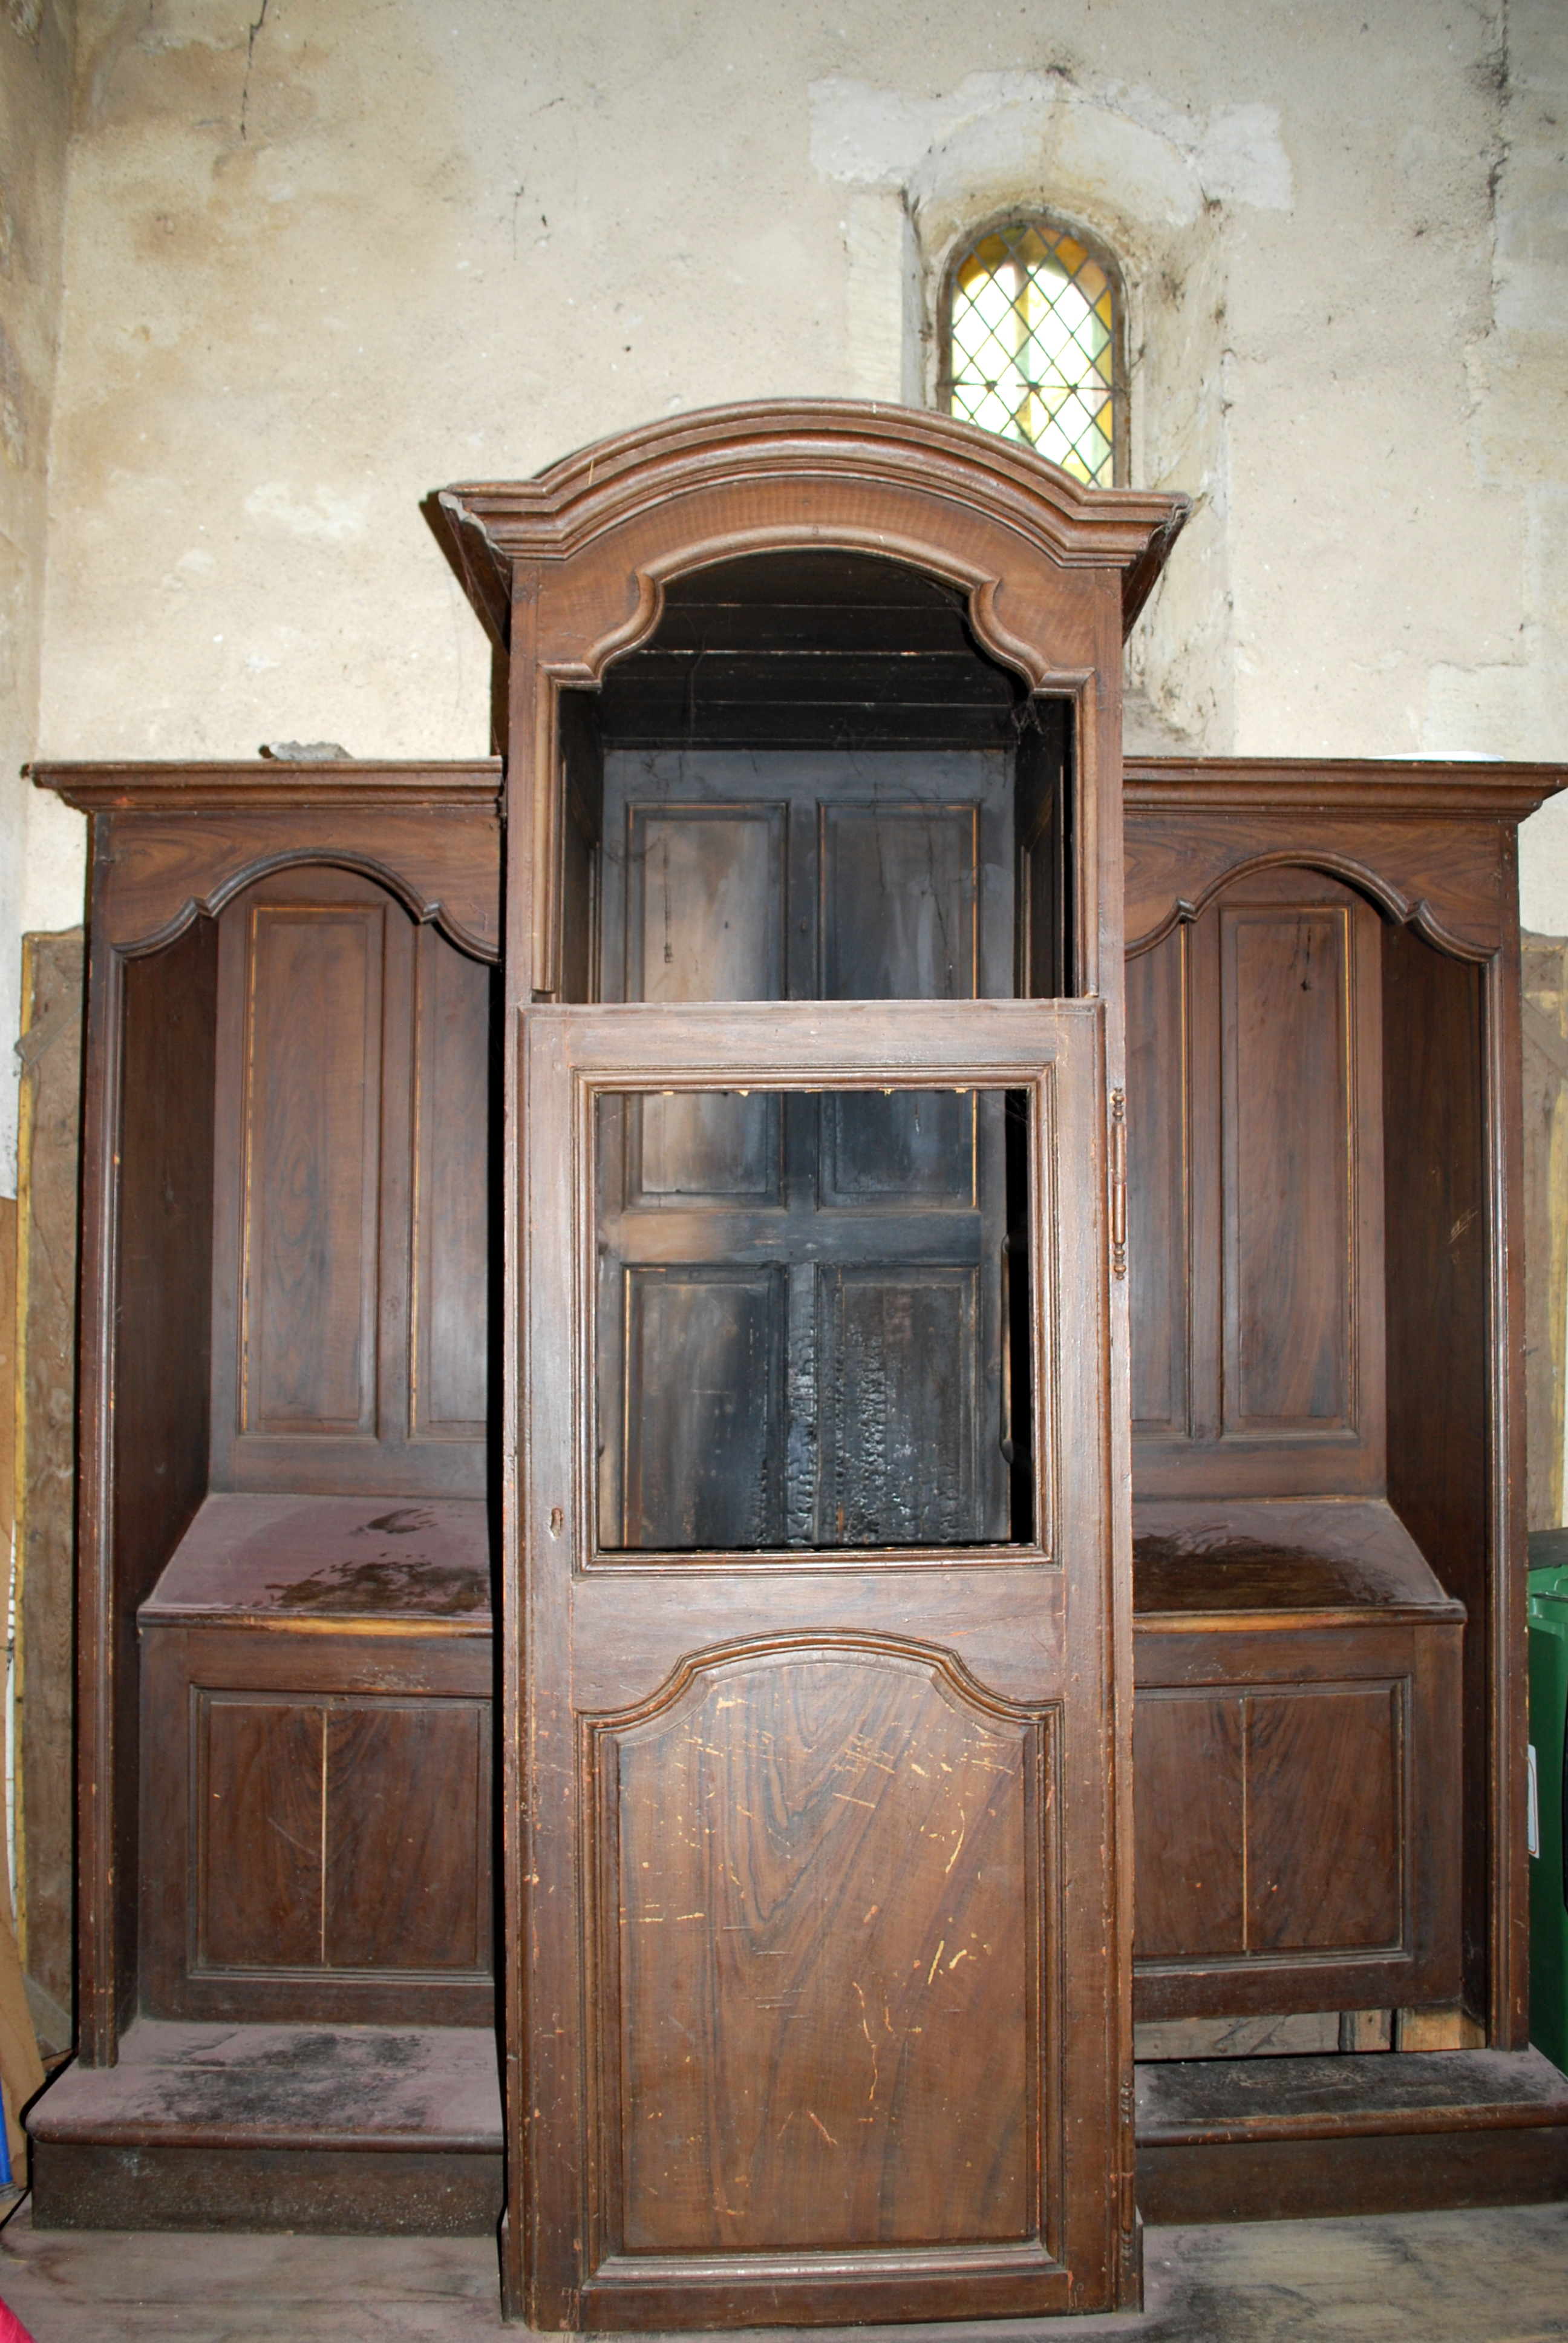 fichier villenave d 39 ornon glise wikip dia. Black Bedroom Furniture Sets. Home Design Ideas